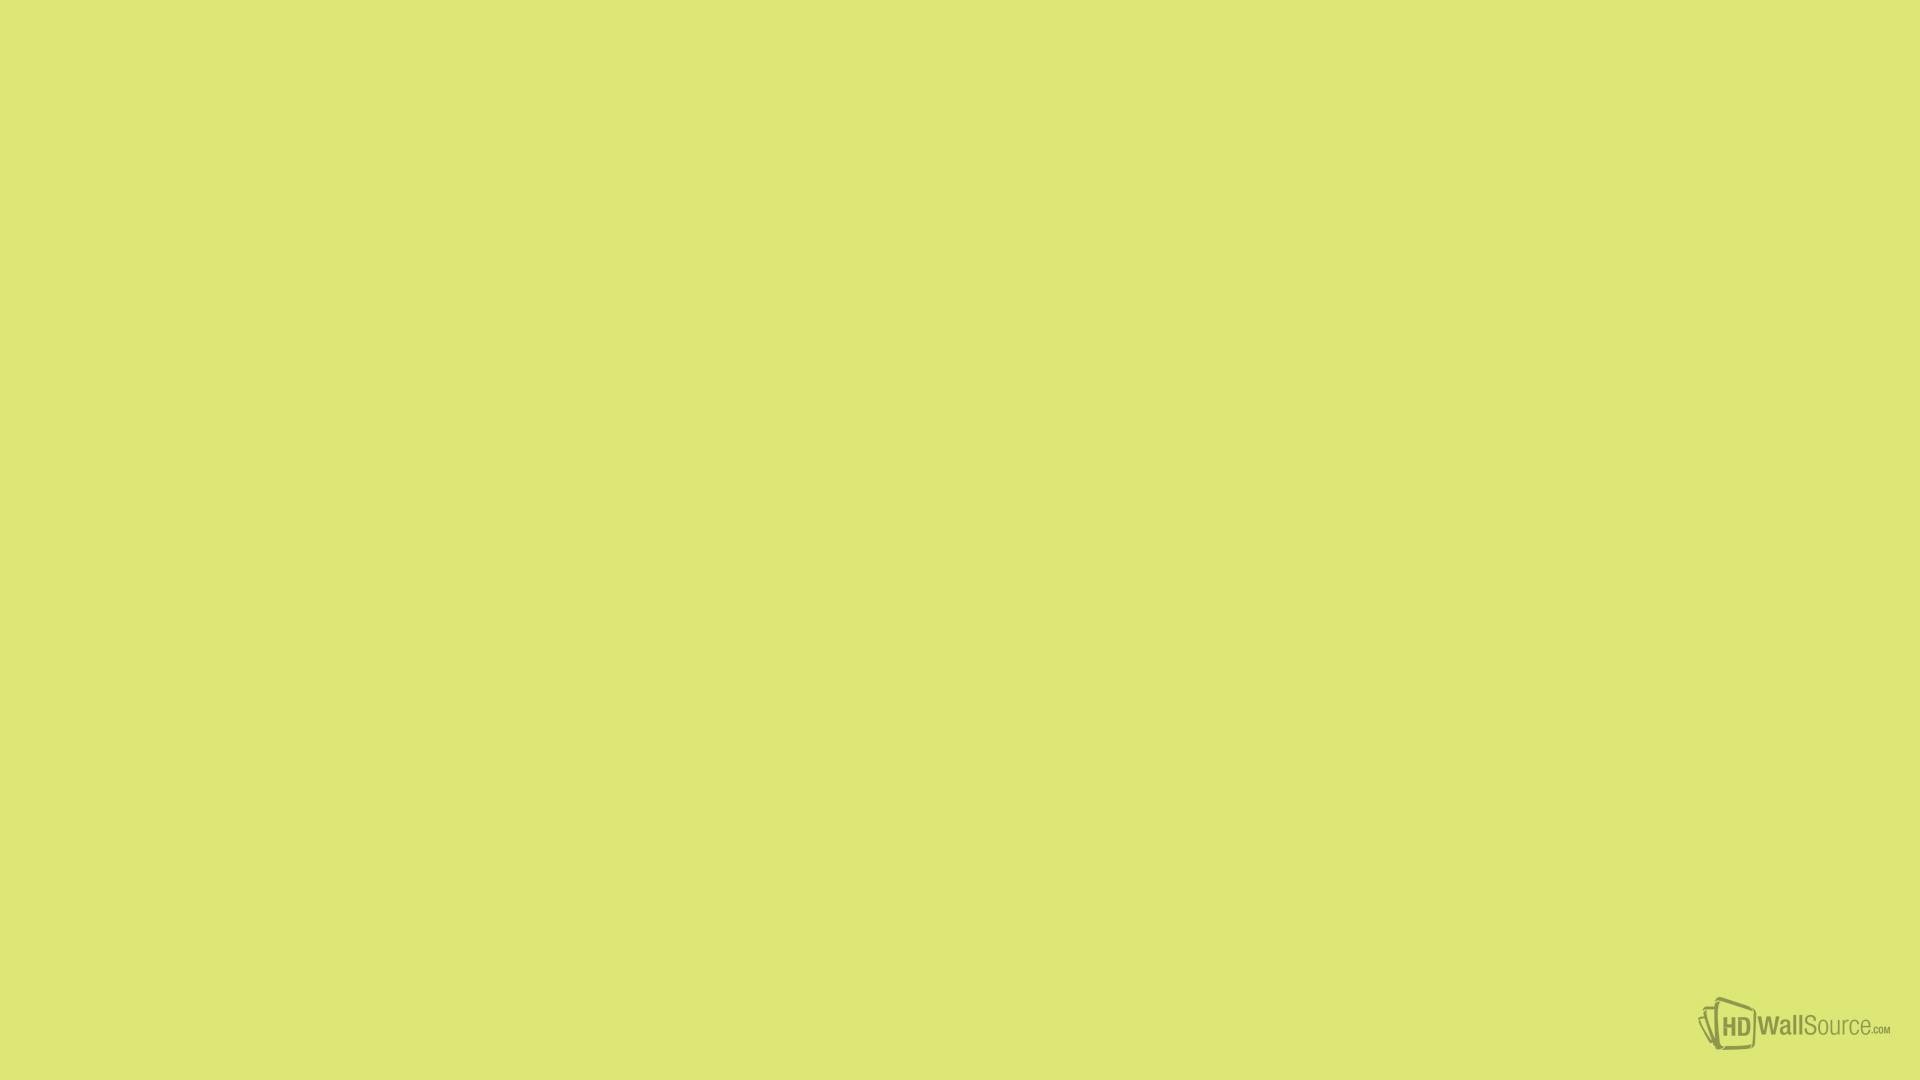 dce775 wallpaper 70530